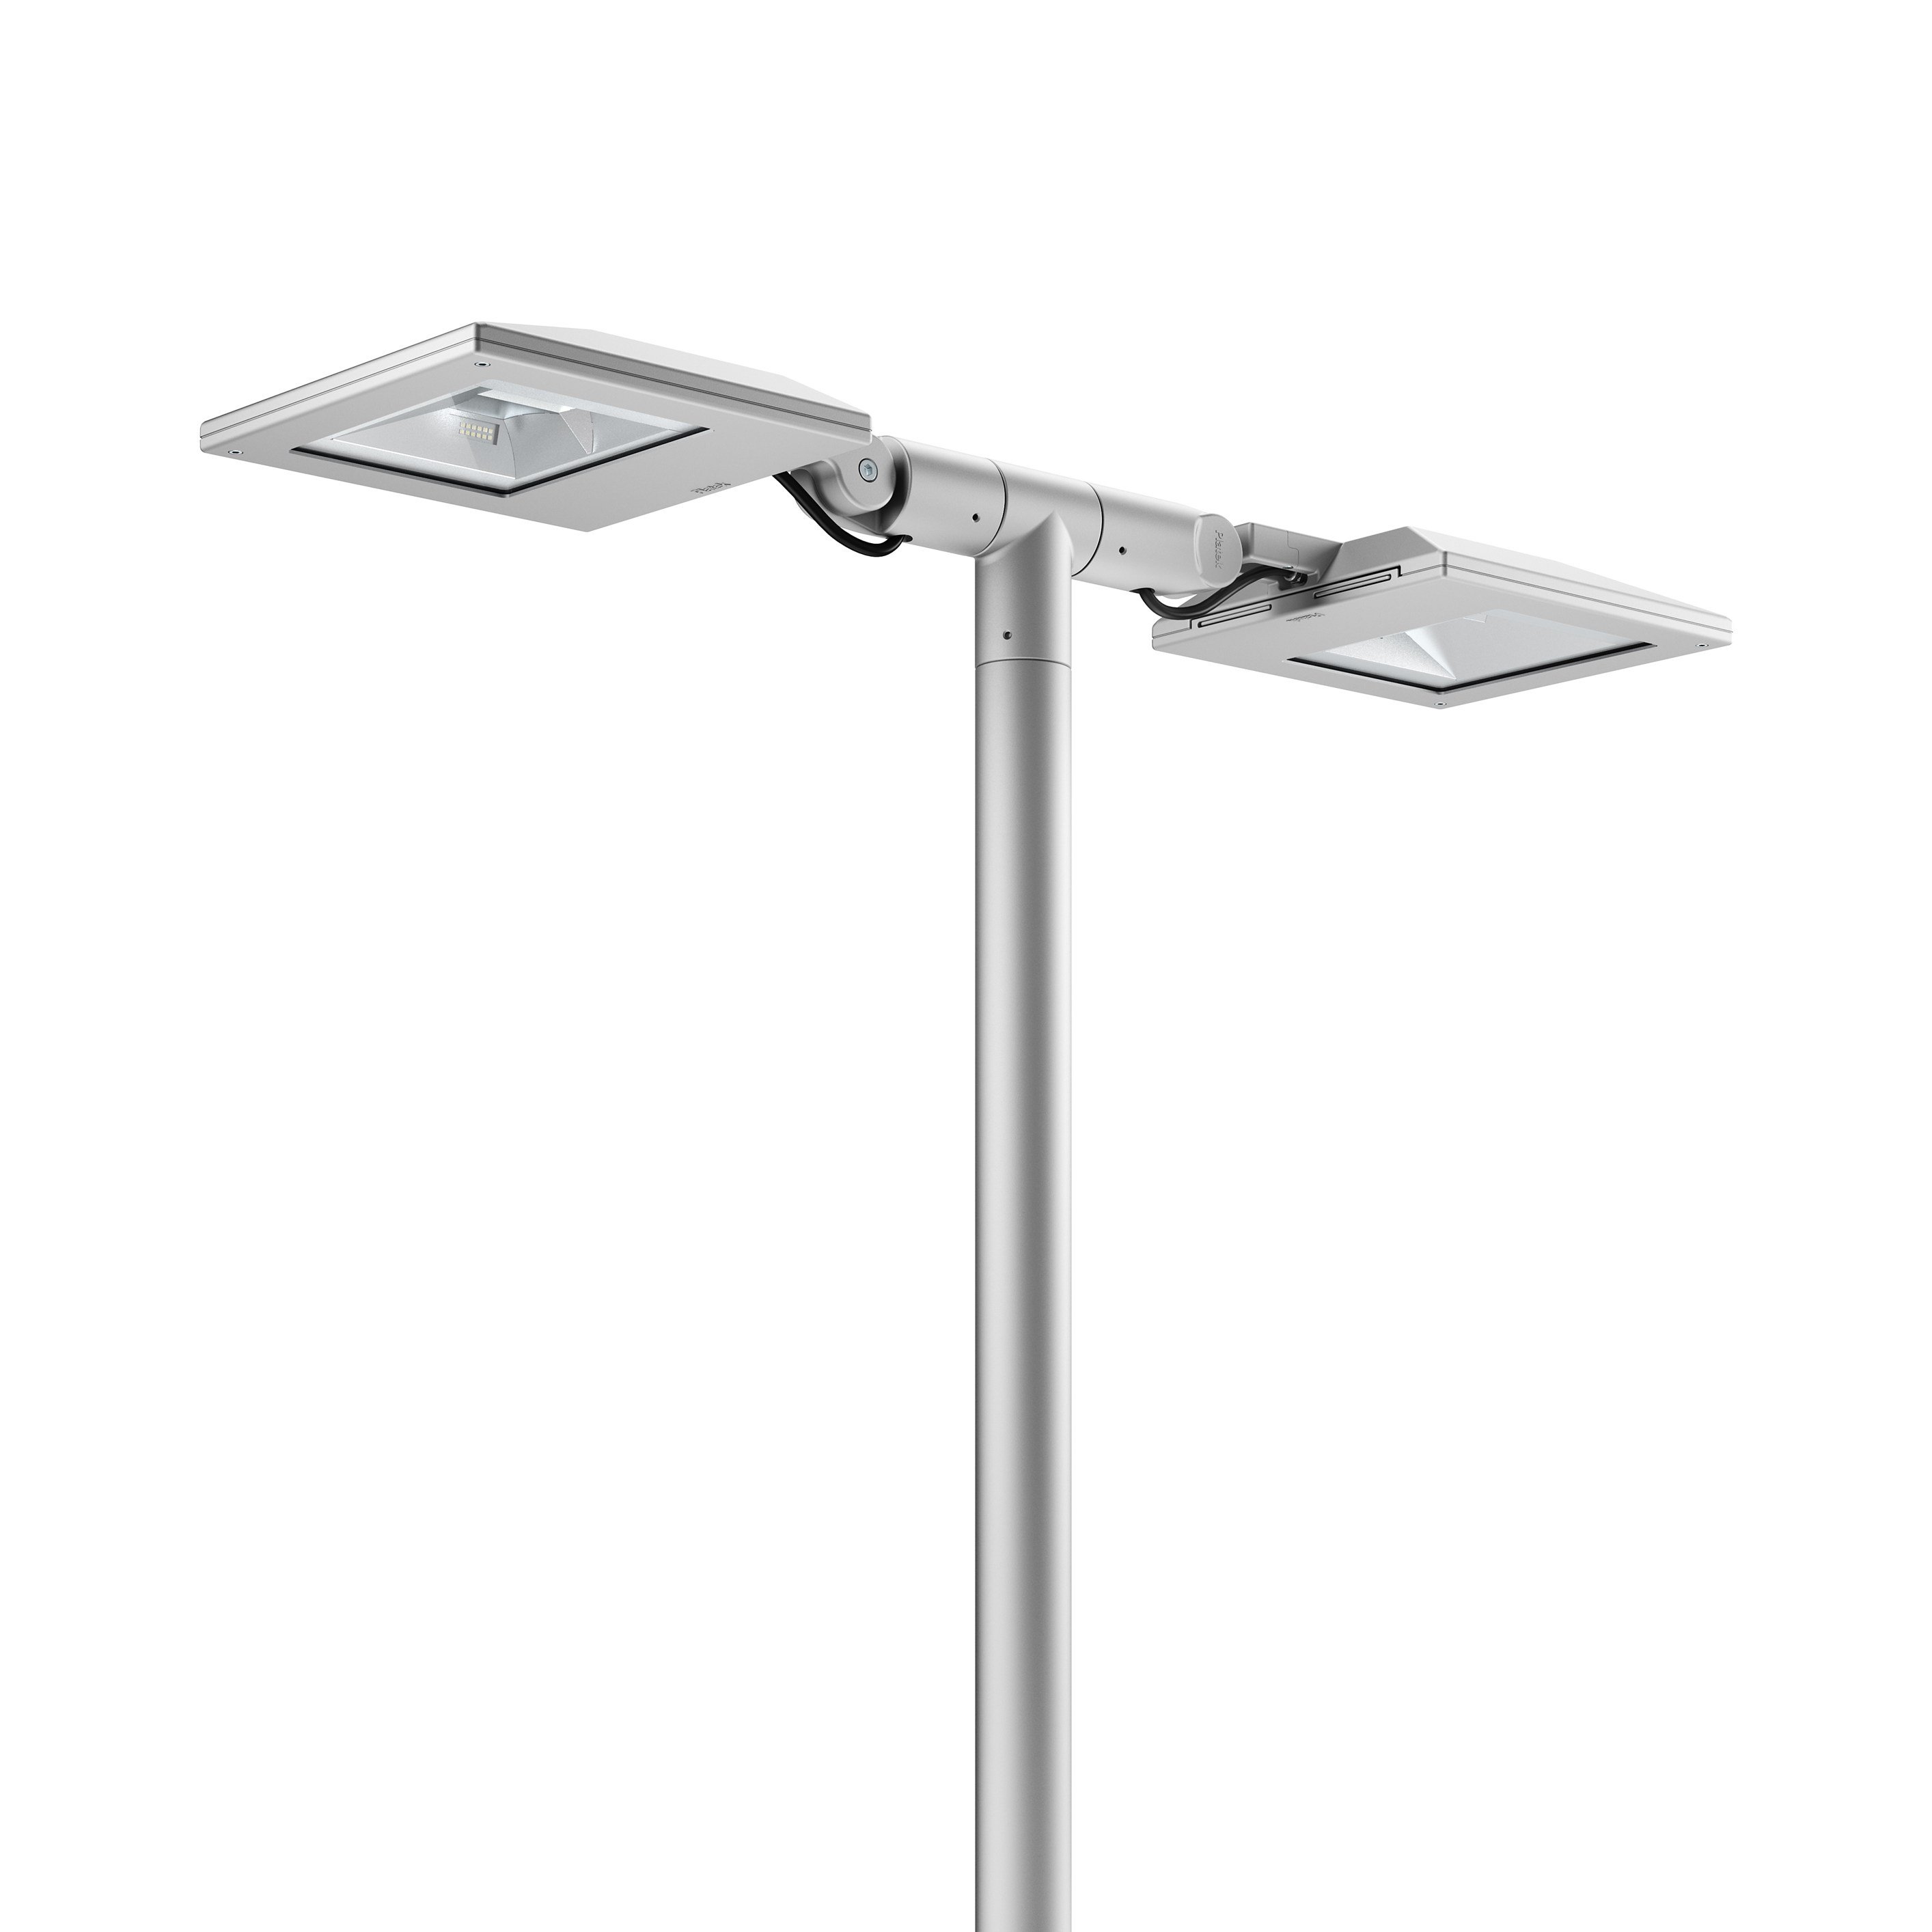 iluminacao led jardins:Poste de jardim LED de alumínio TARSIUS Testa Palo by Platek design